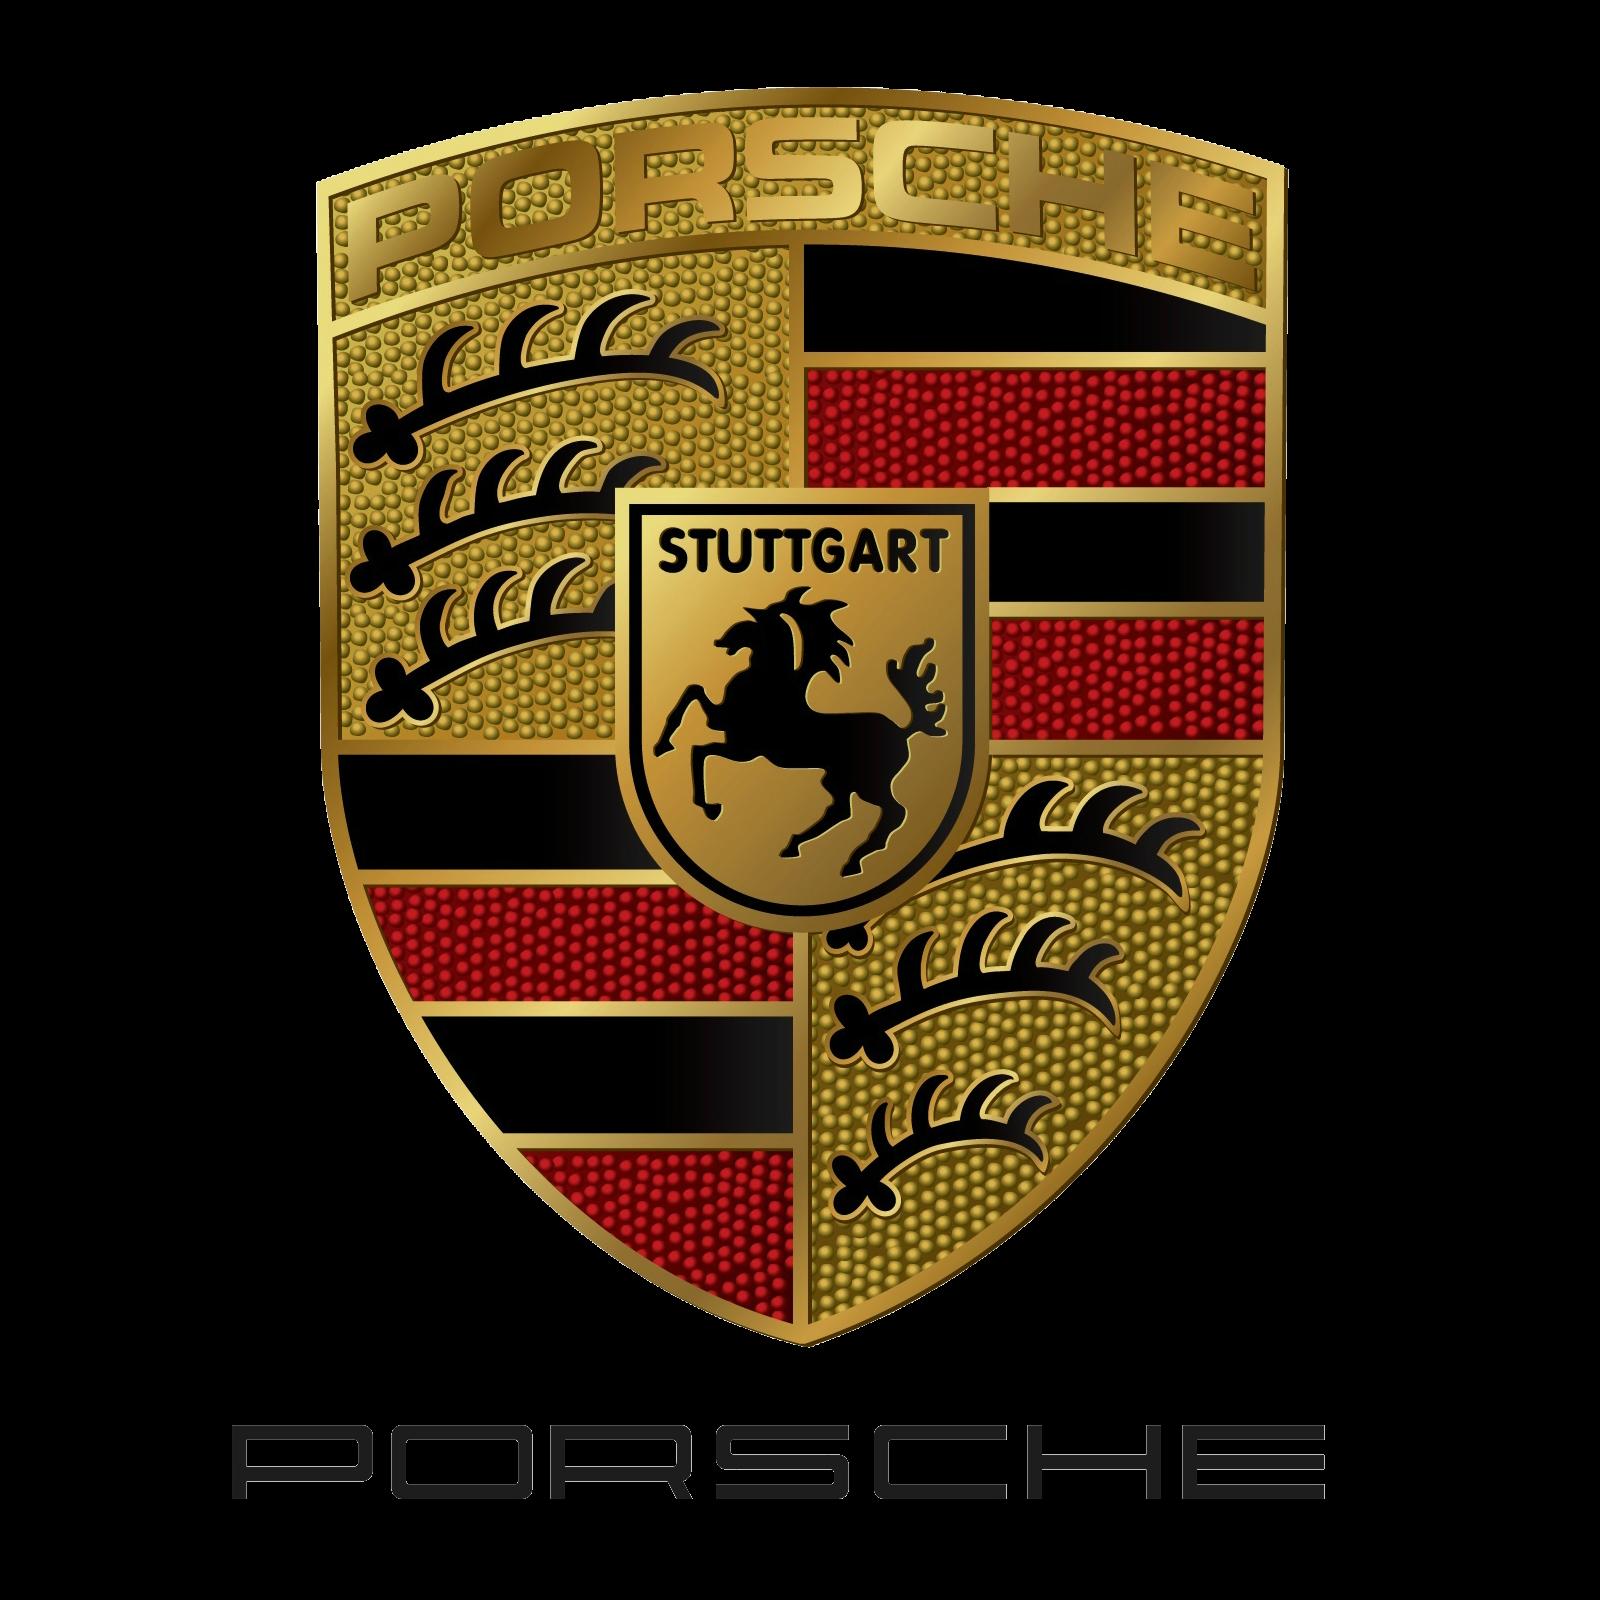 New Porsche, BMW, MINI, Bentley, Rolls